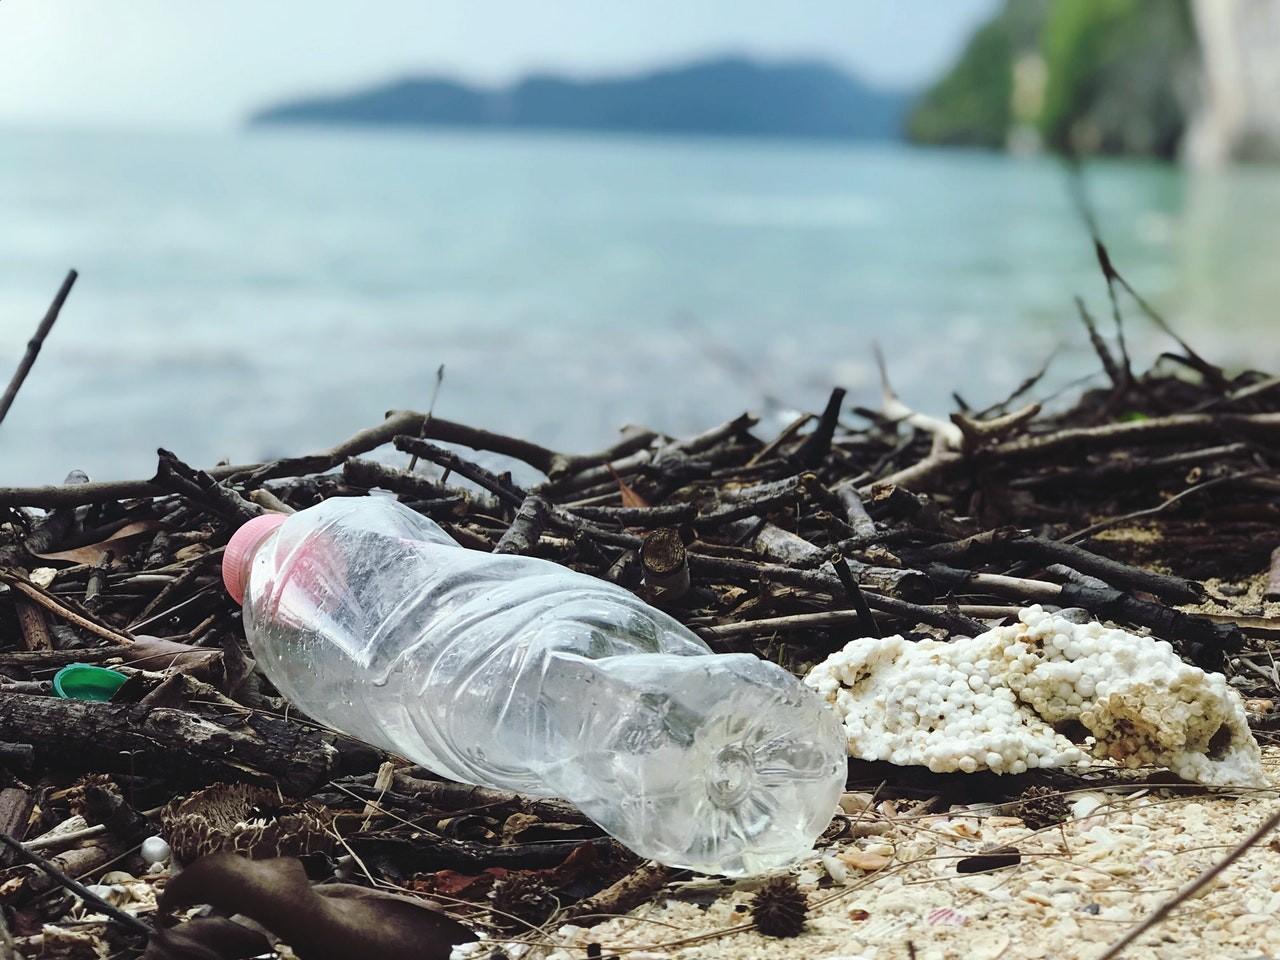 wegwerpplastic-verbannen-thedailygreen